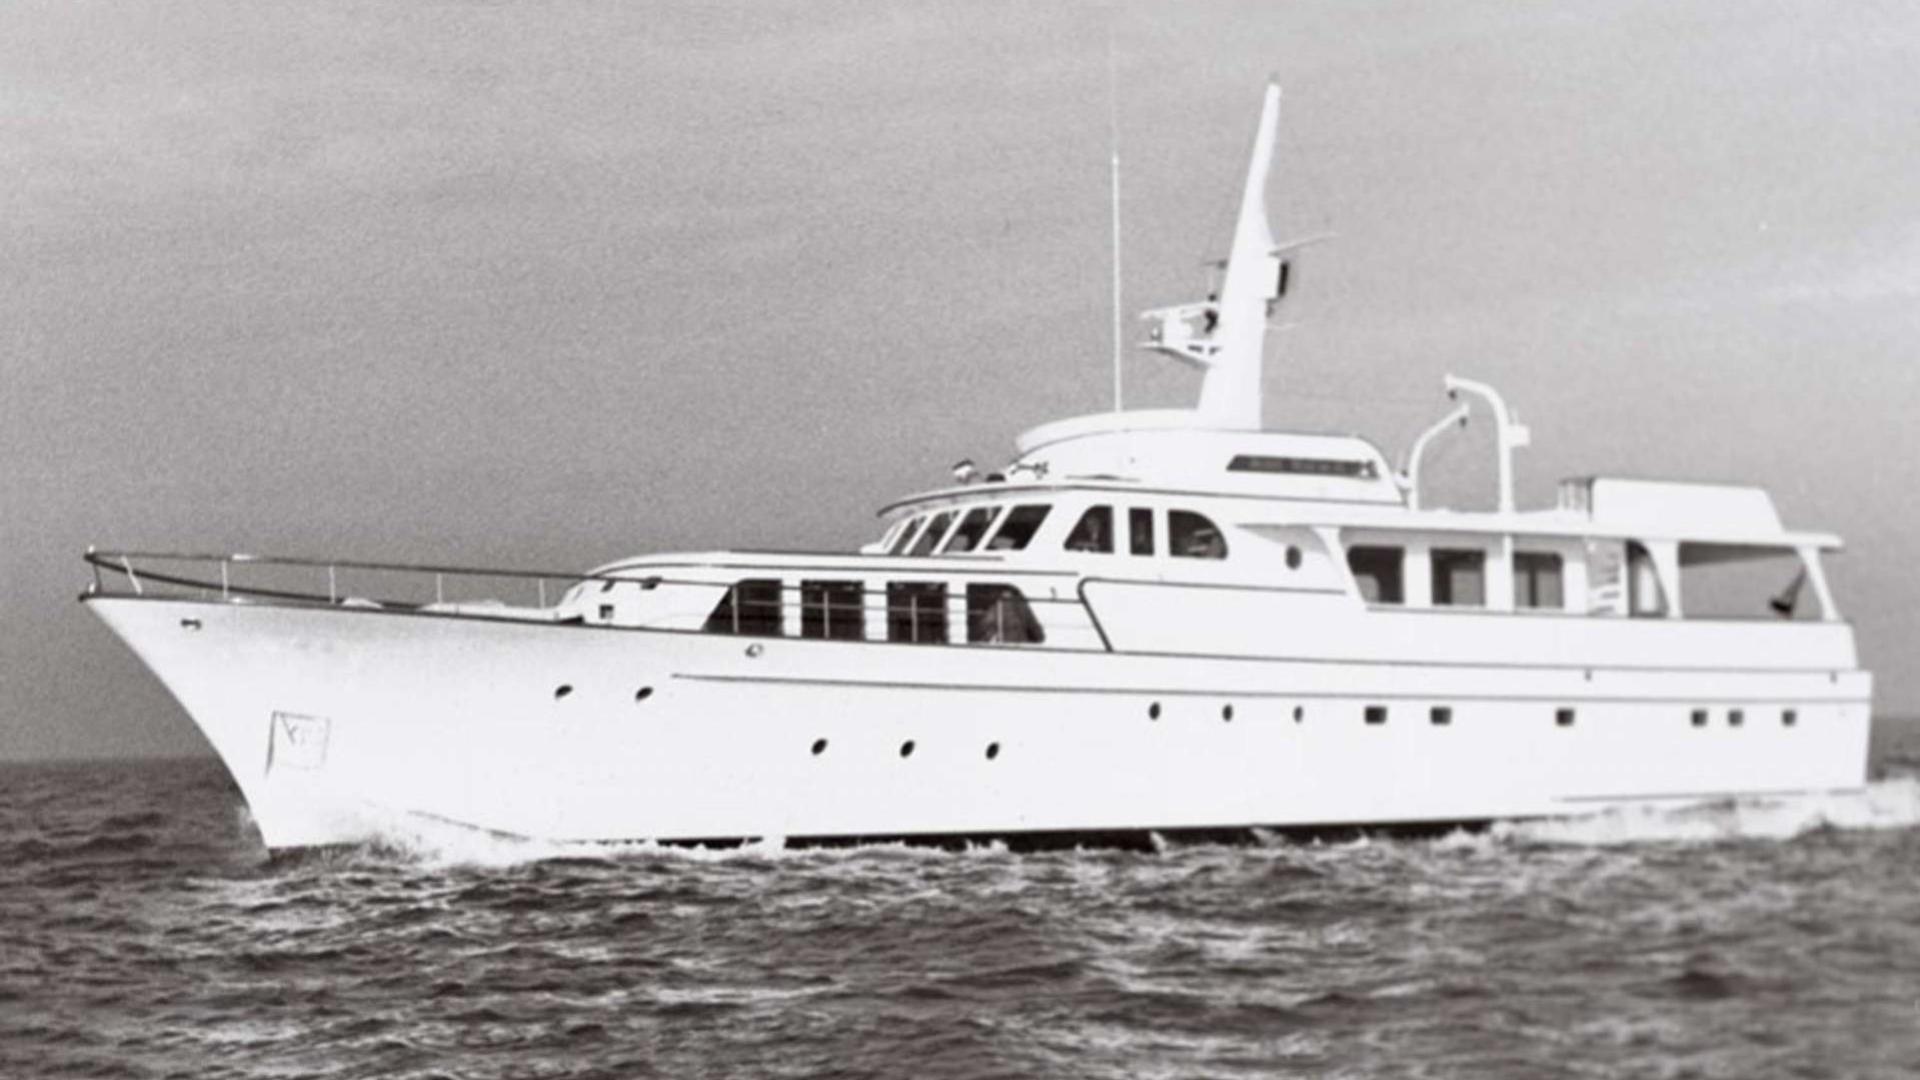 shintaroh-motor-yacht-feadship-1970-31m-profile